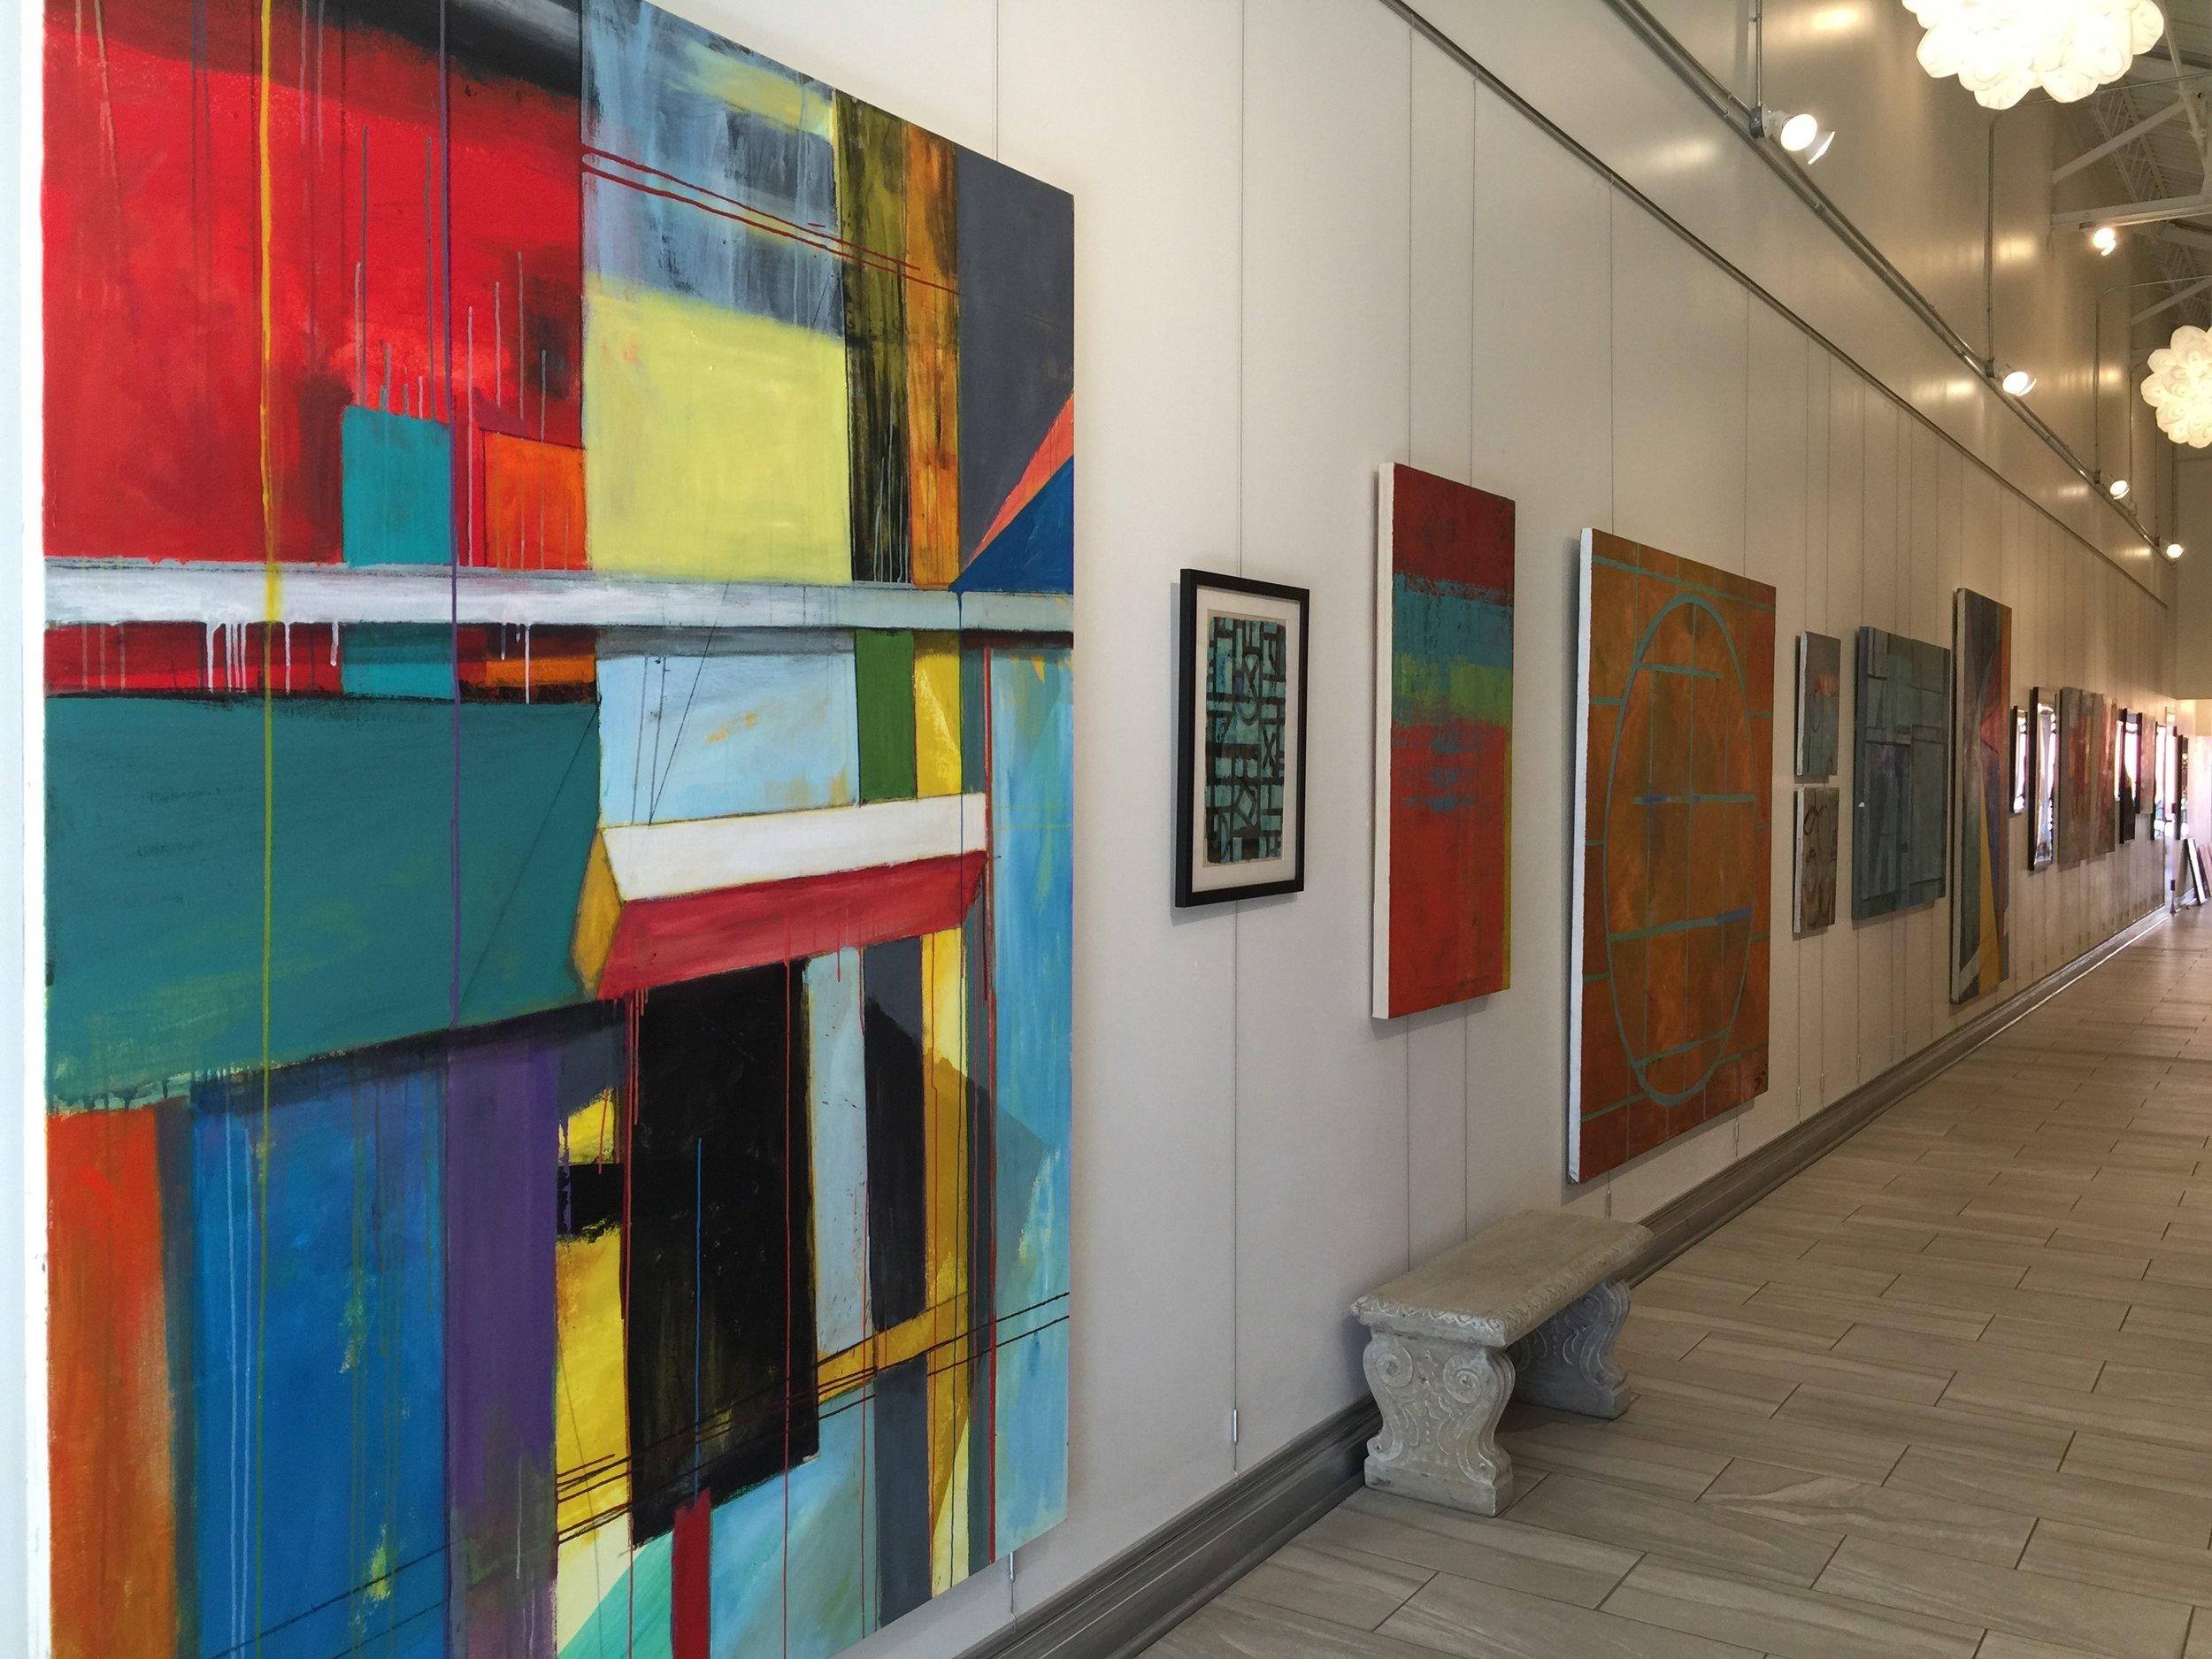 Susan Morrison-Dyke and Tony Dyke: Recent Work, Oct 2016-Jan 2017